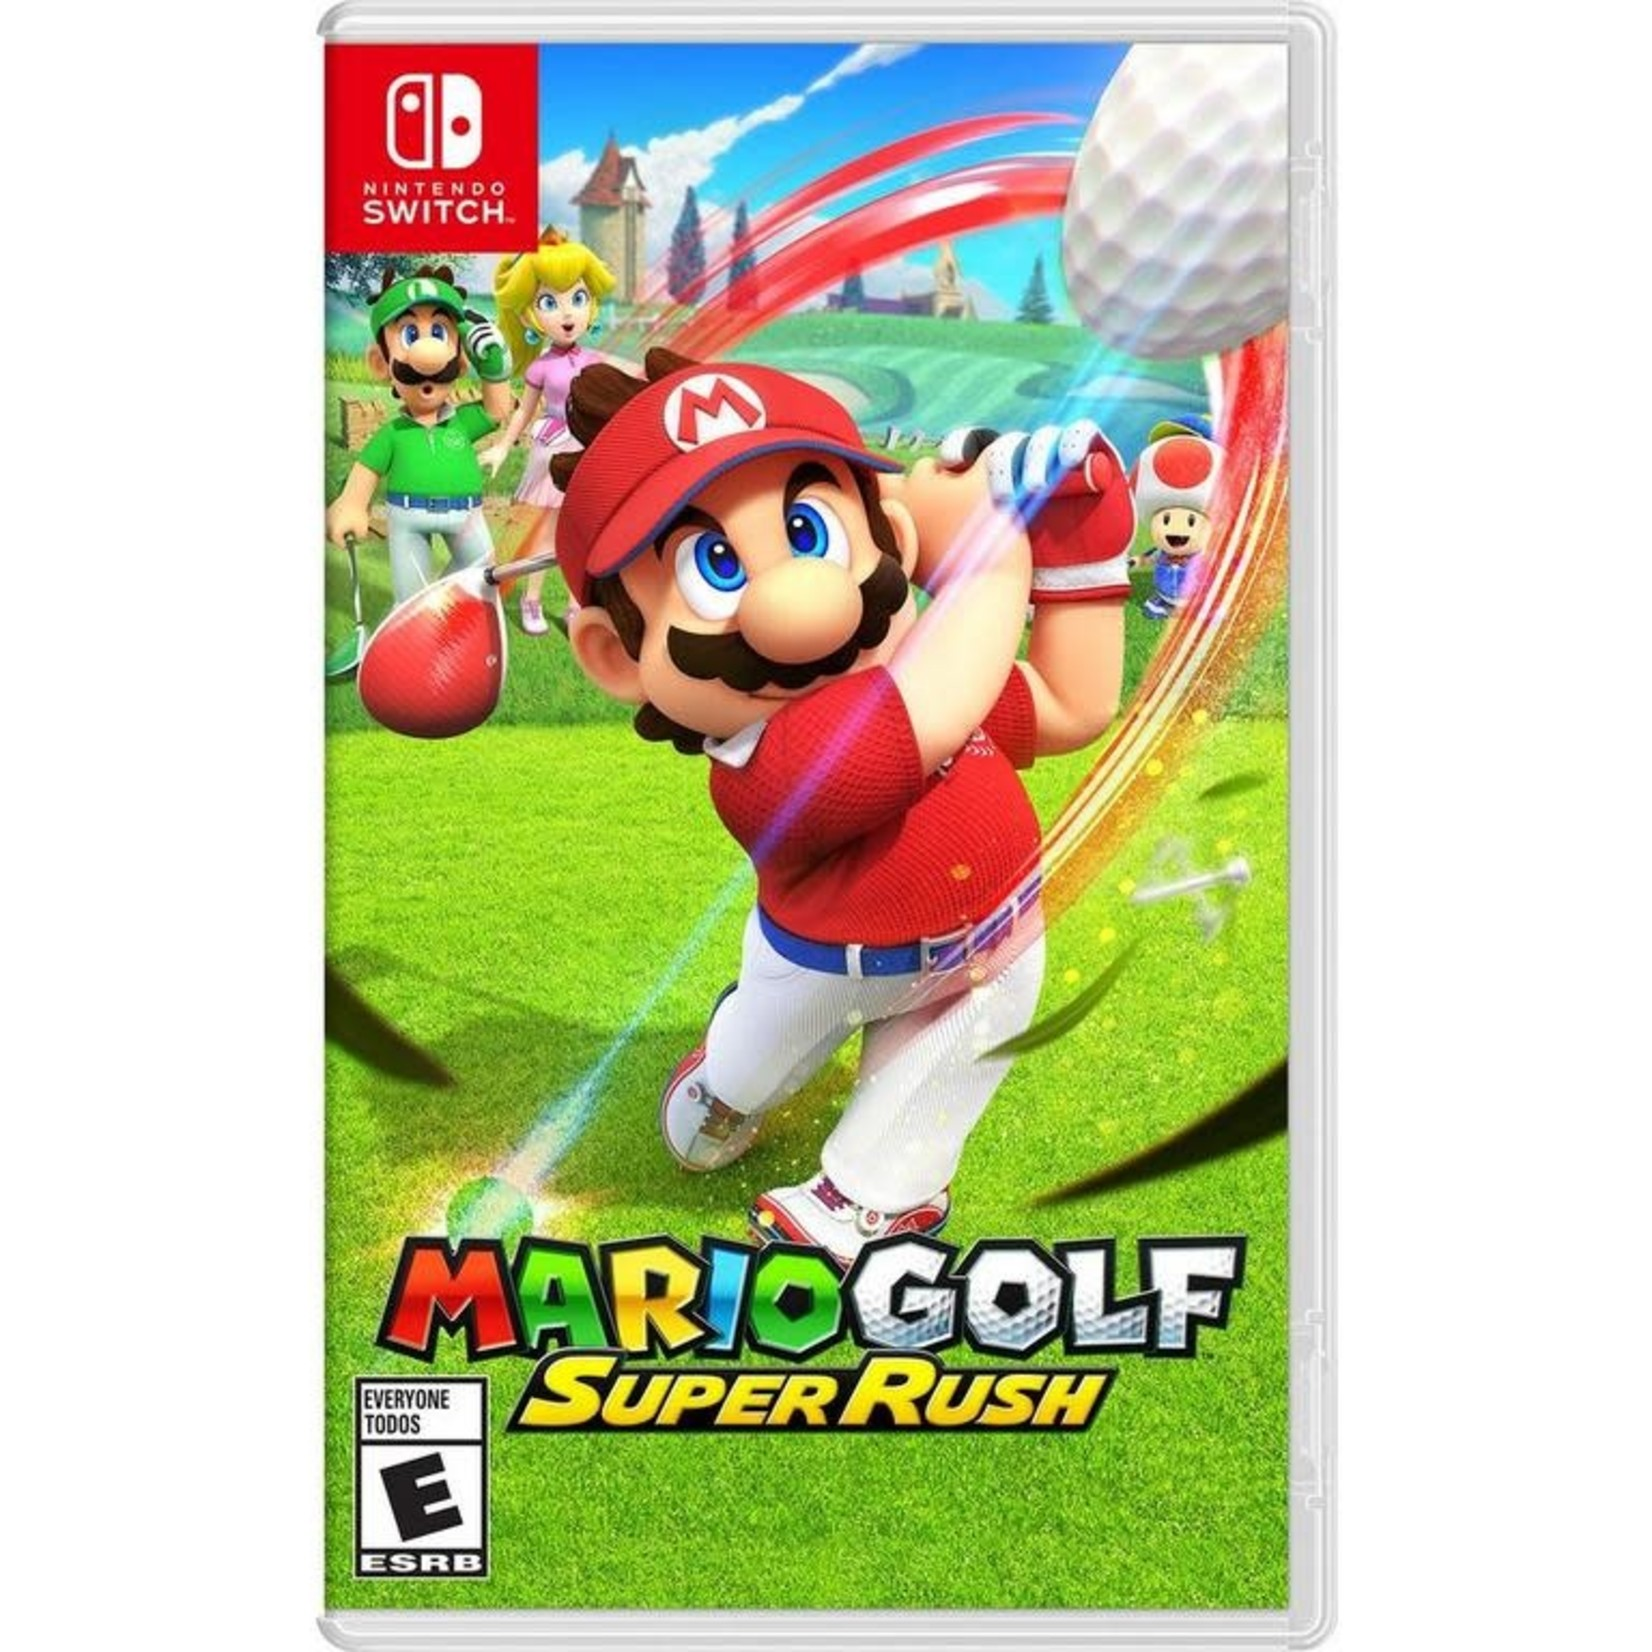 SWITCH-Mario Golf: Super Rush